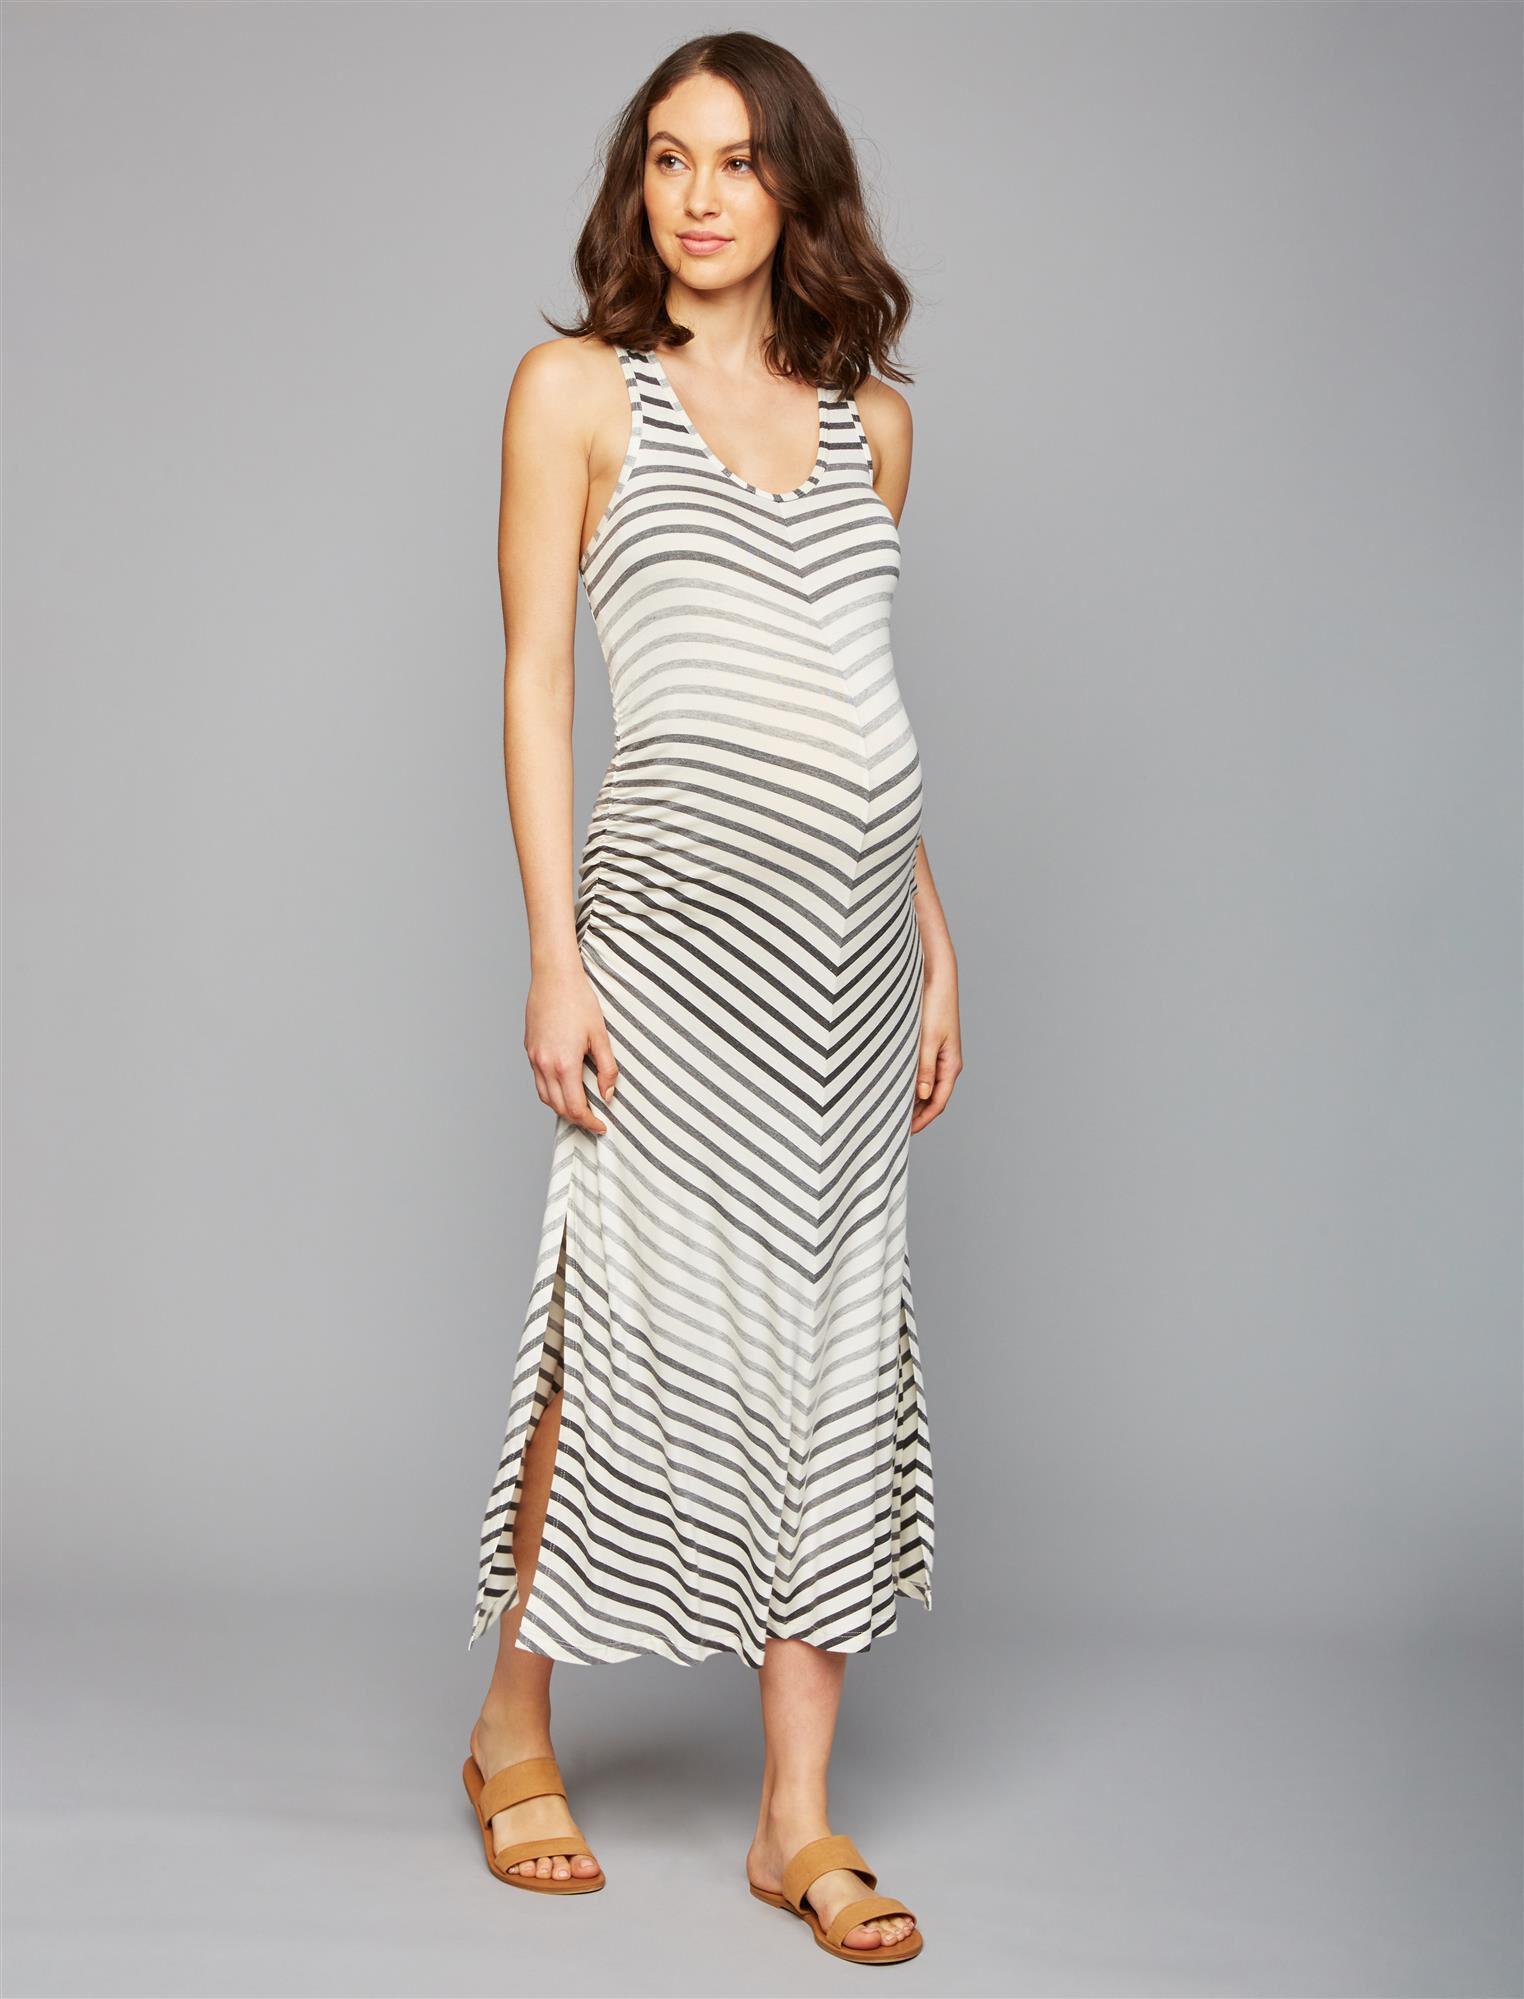 Beyond The Bump Striped Maternity Dress